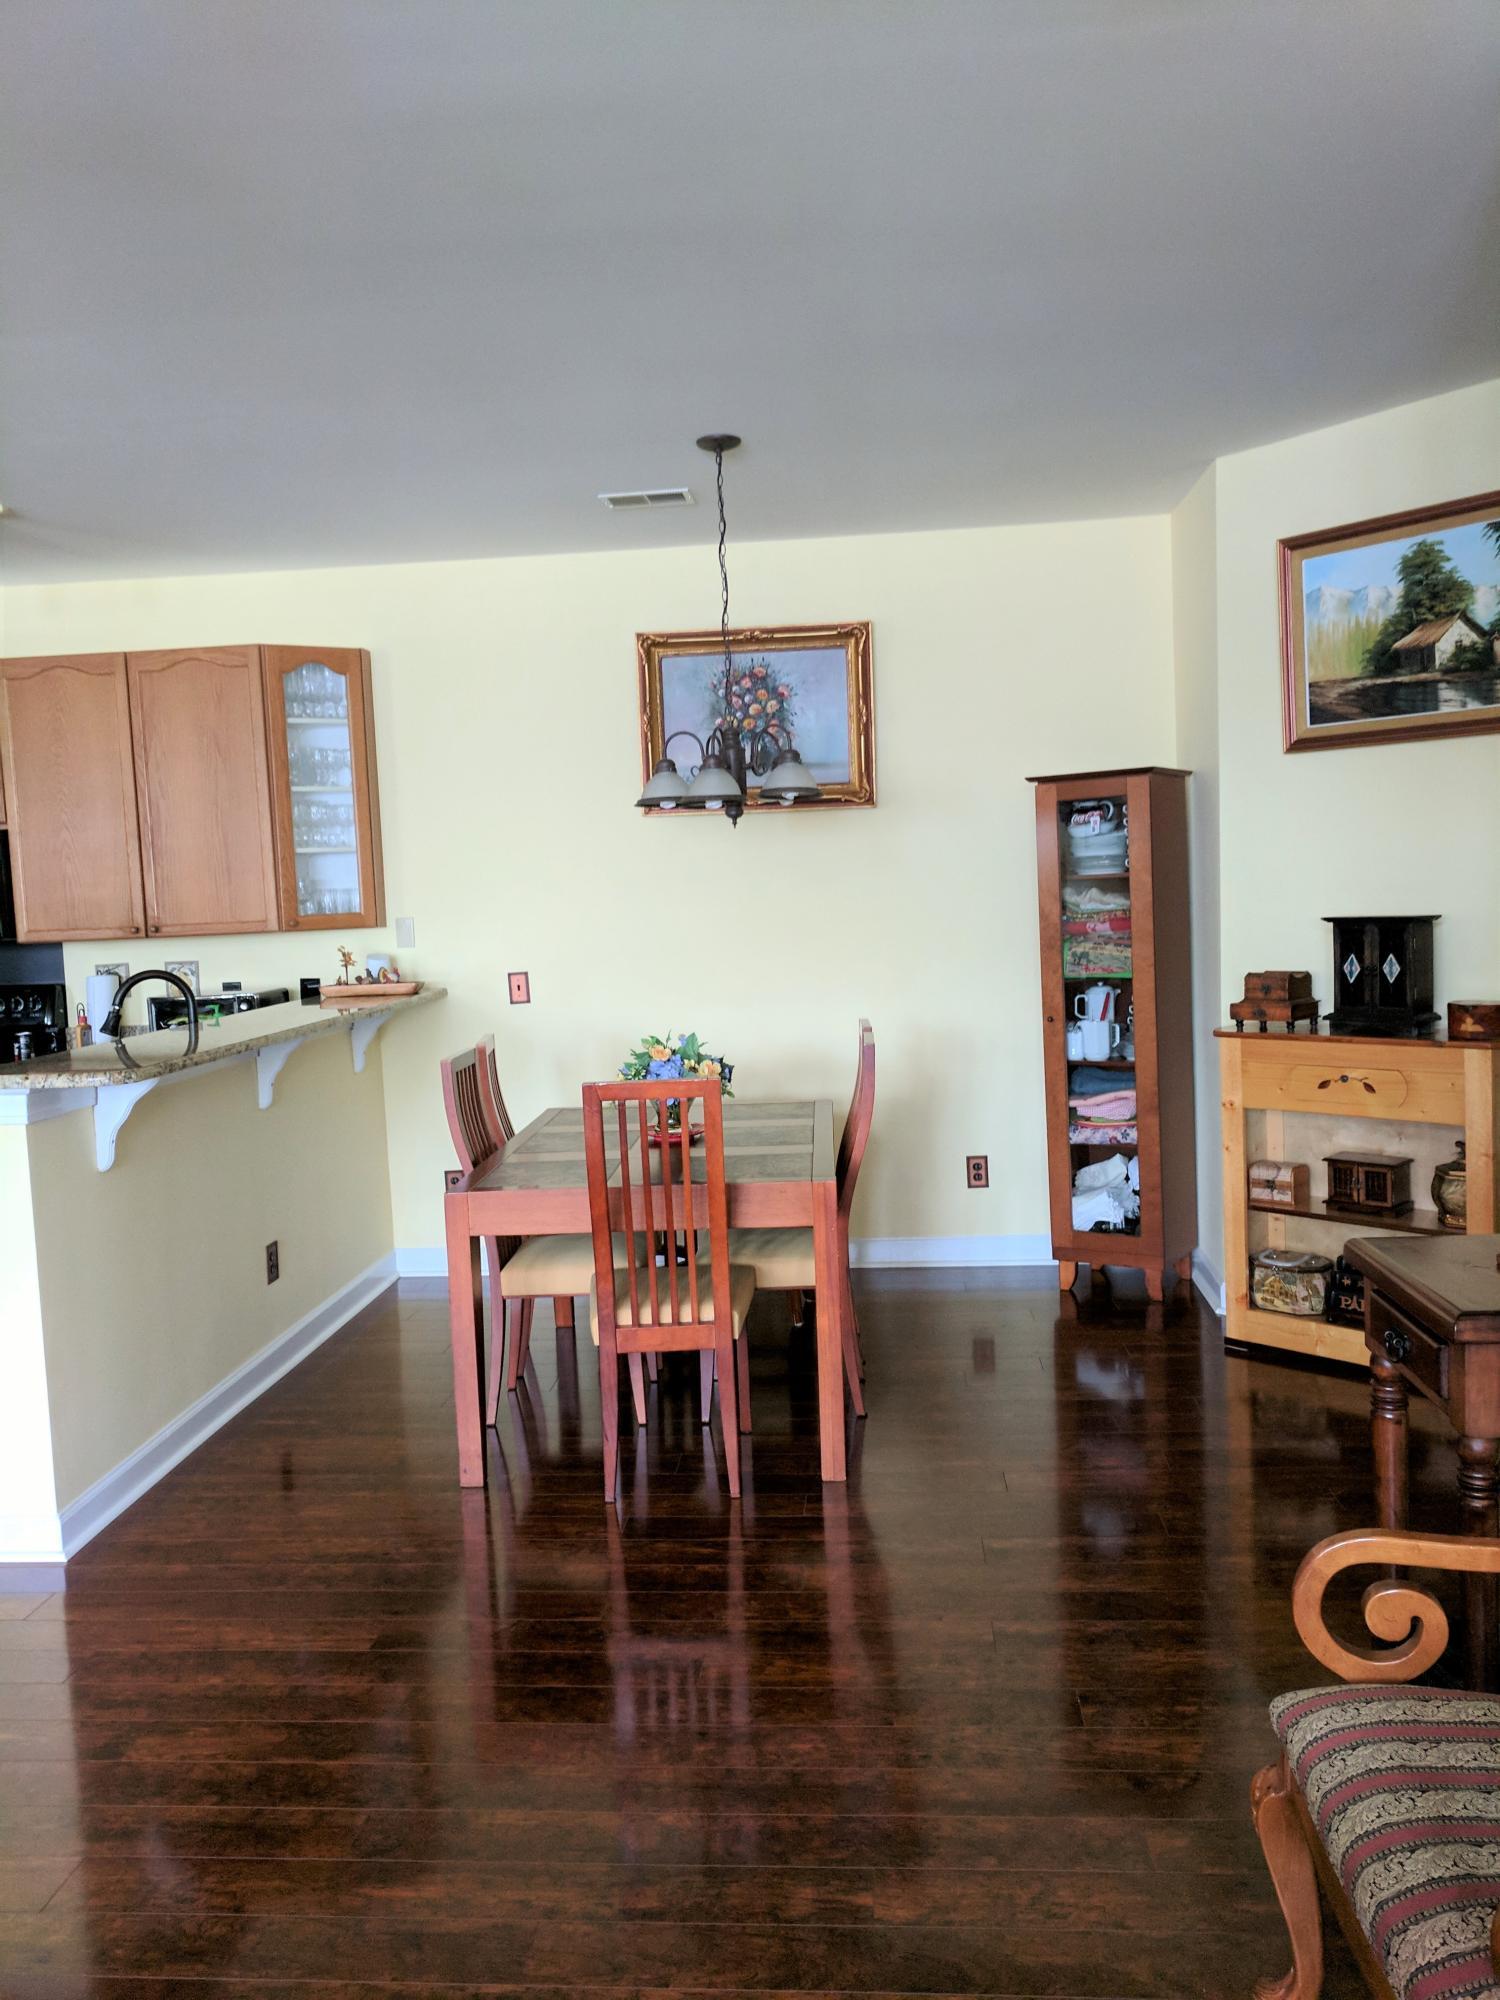 Dunes West Homes For Sale - 1362 Kingsford, Mount Pleasant, SC - 11